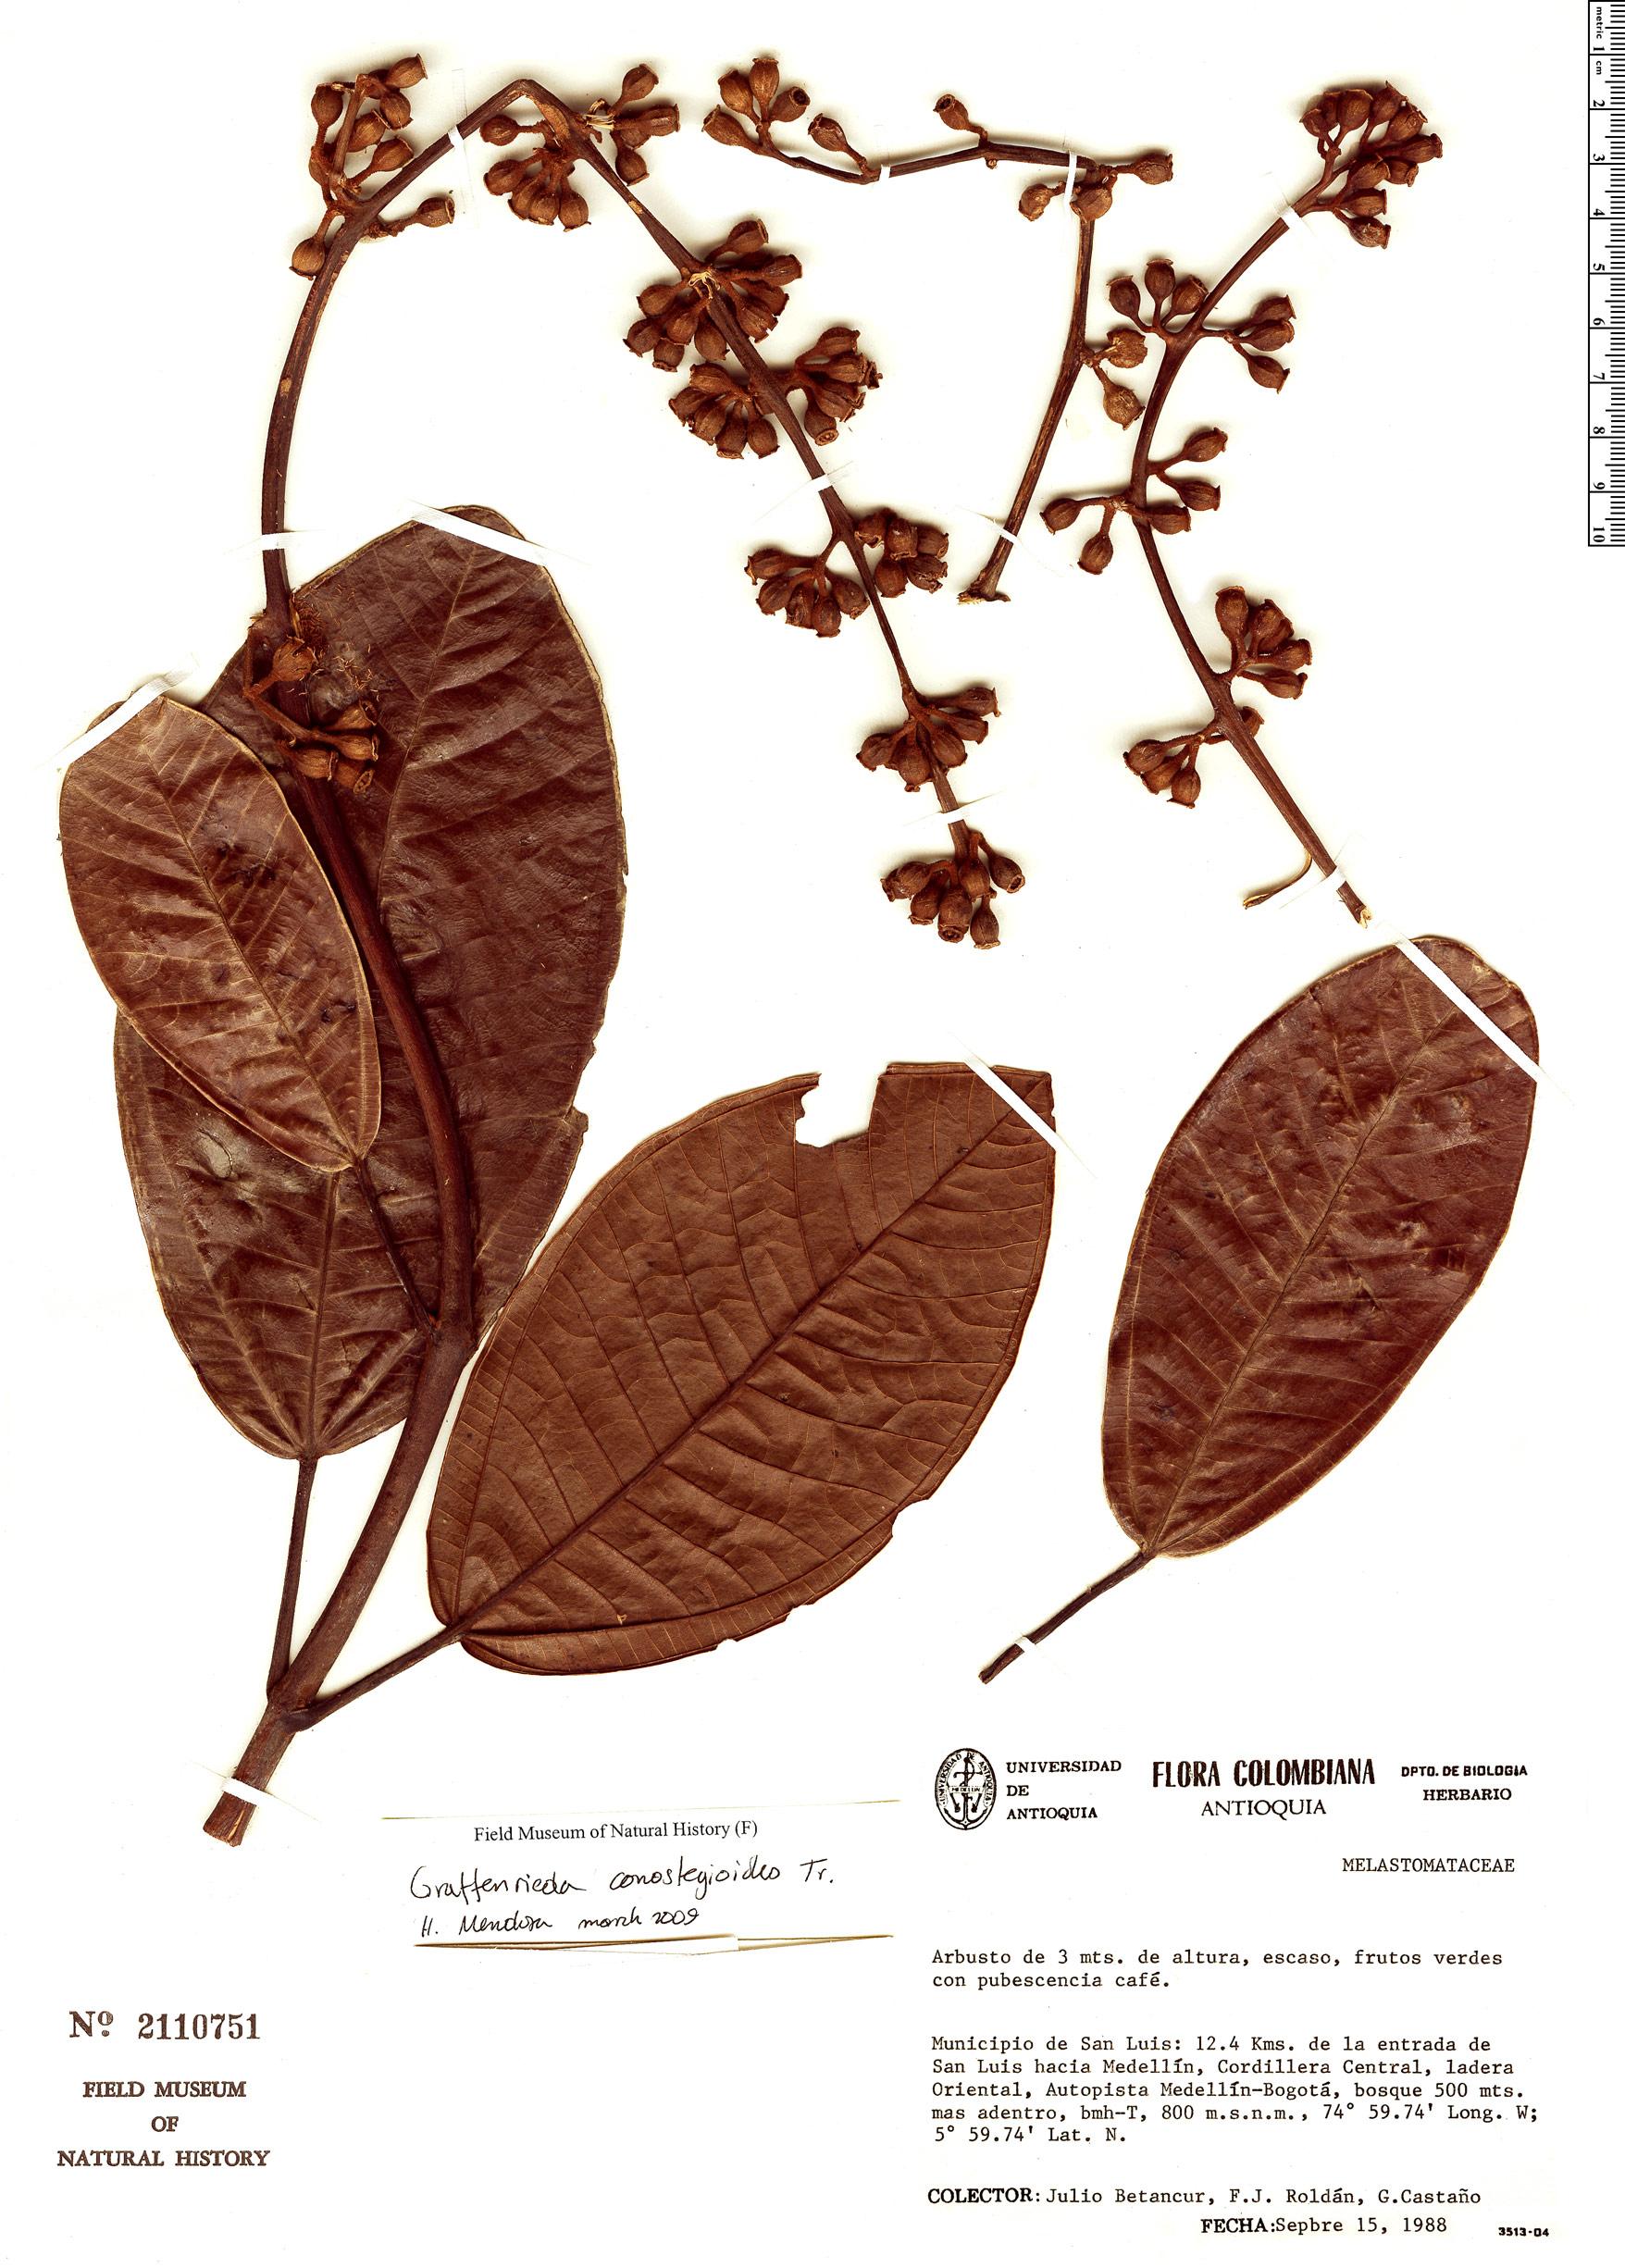 Specimen: Graffenrieda conostegioides